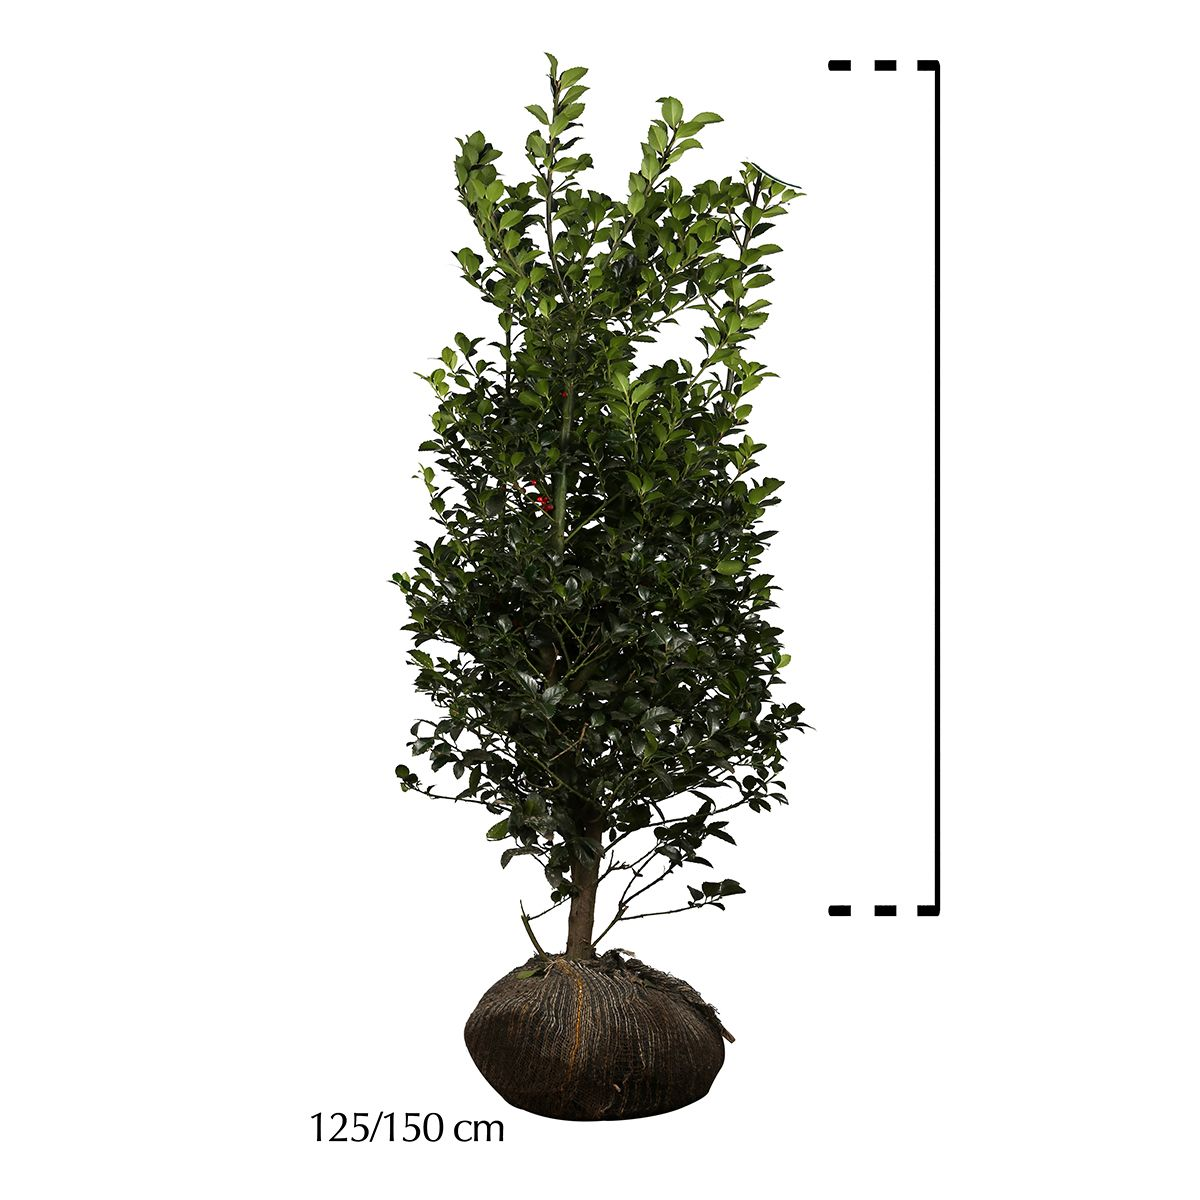 Stechpalme 'Heckenfee' Wurzelballen 125-150 cm